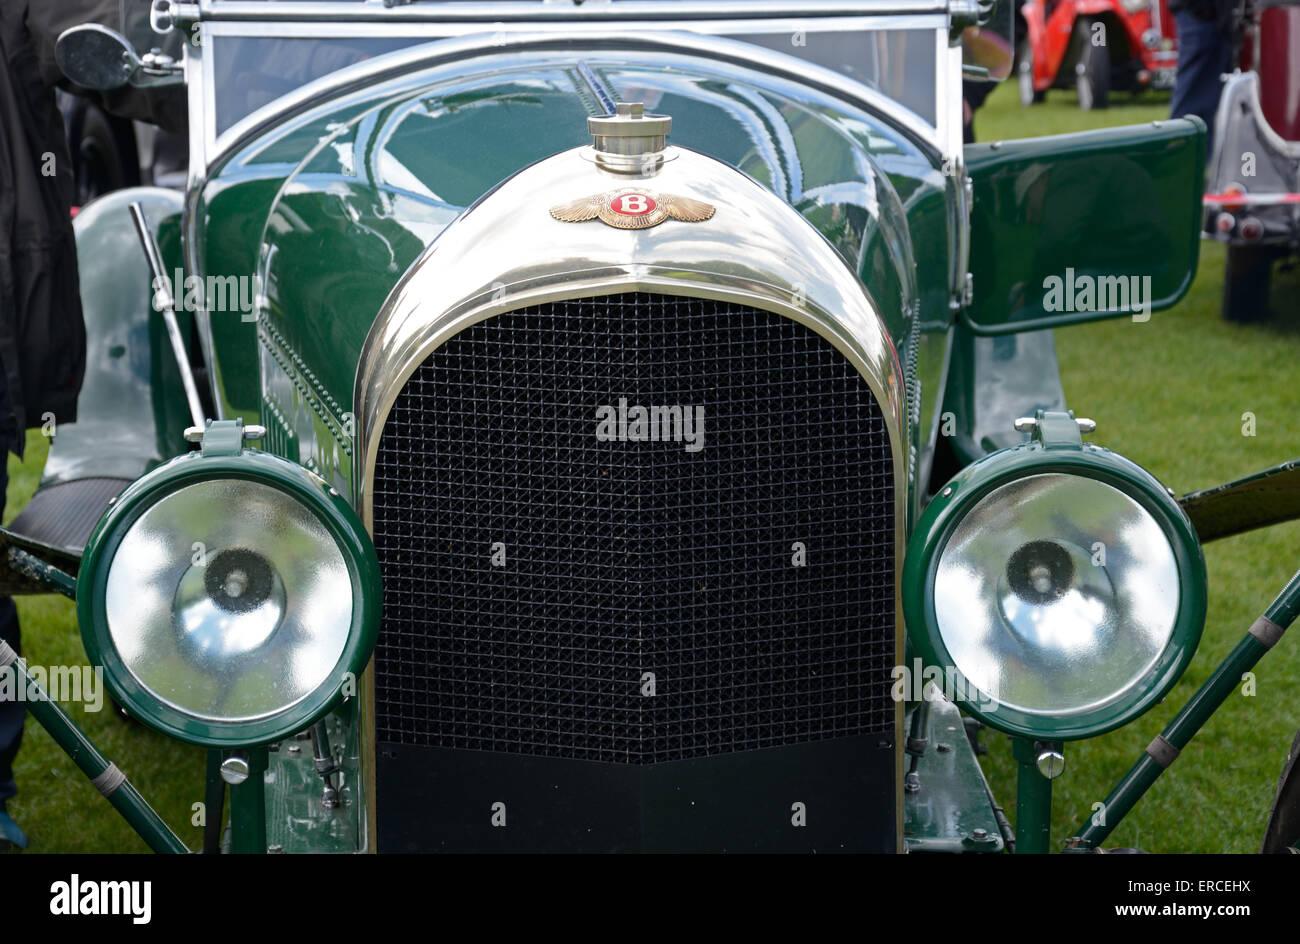 Close up of radiator of 1930's Bentley, Wollaton Park, Nottingham, England. - Stock Image